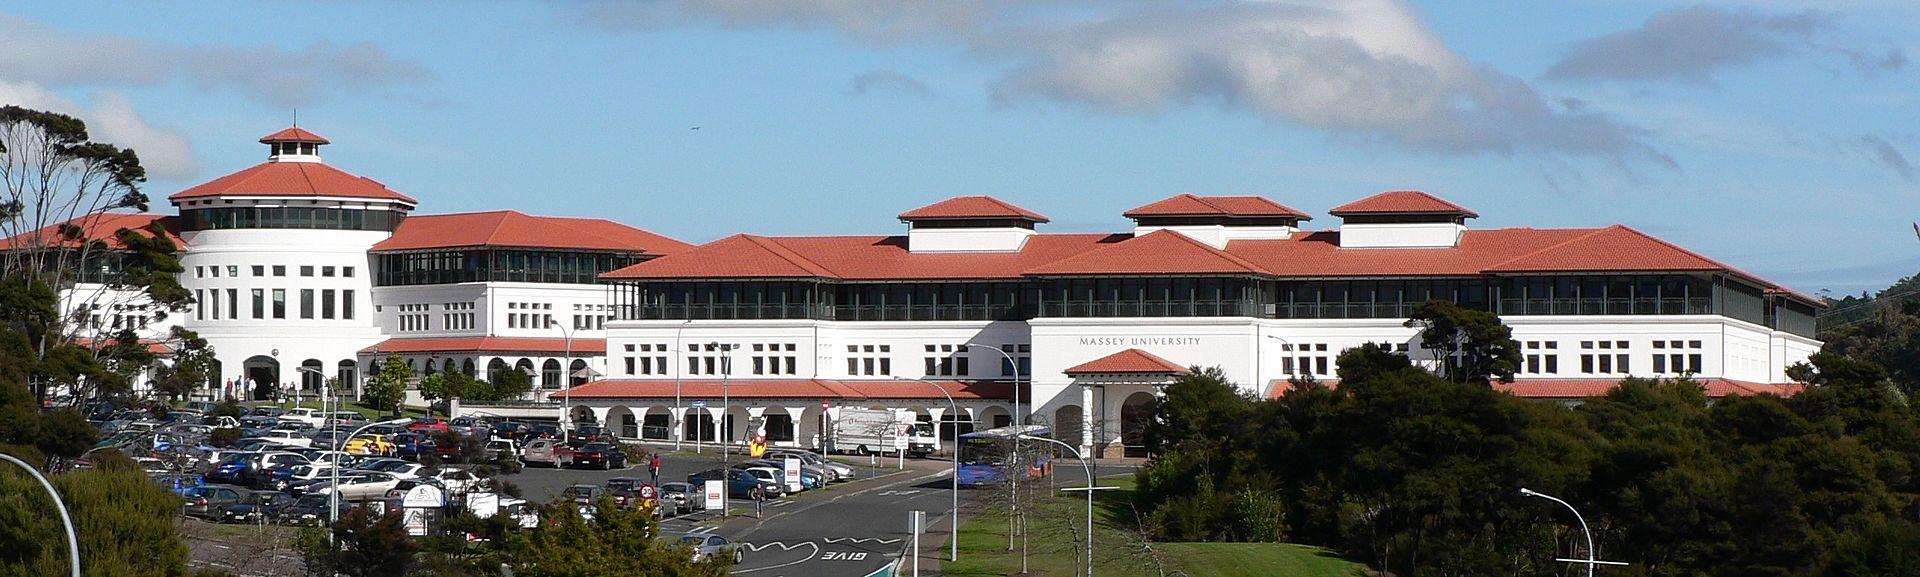 Uniwersytet Massey (fot.Nzv8fan, wikipedia.org)